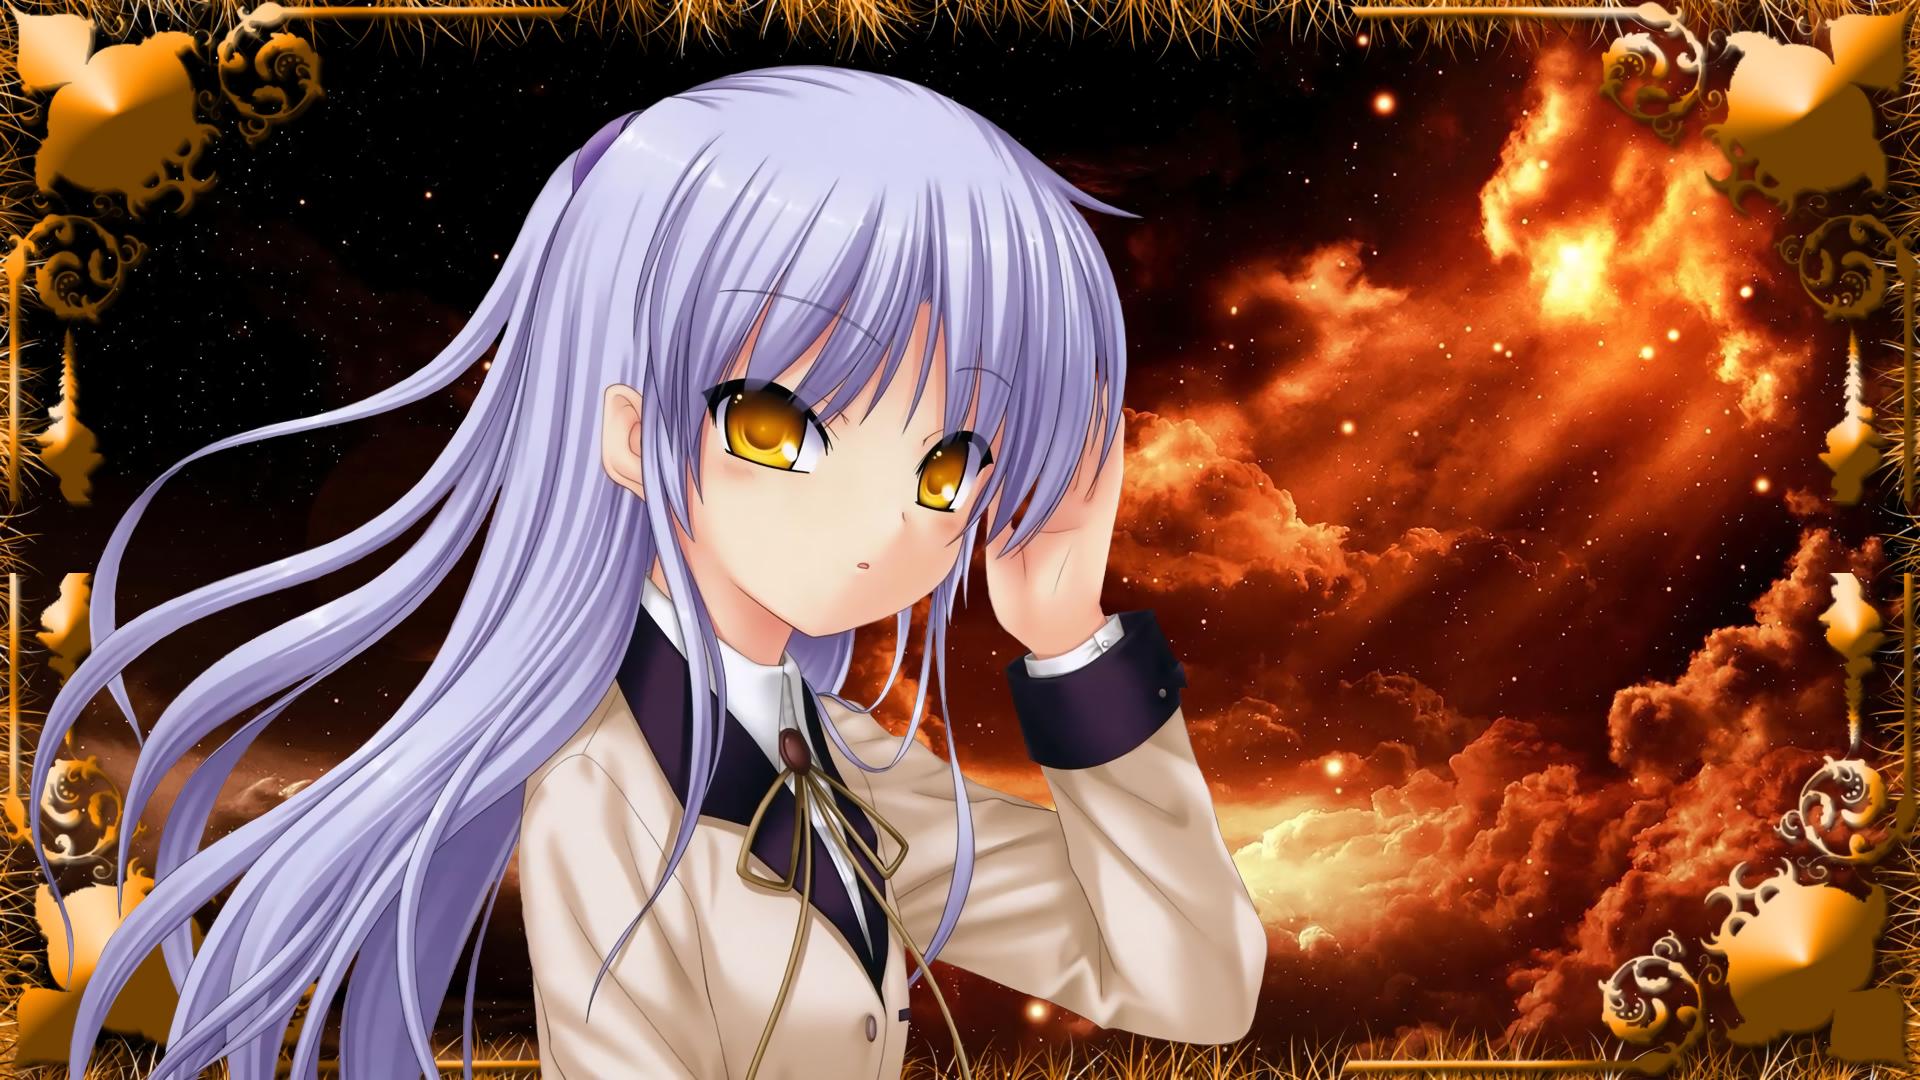 Wallpaper Anime Angel Beats Mythology Screenshot